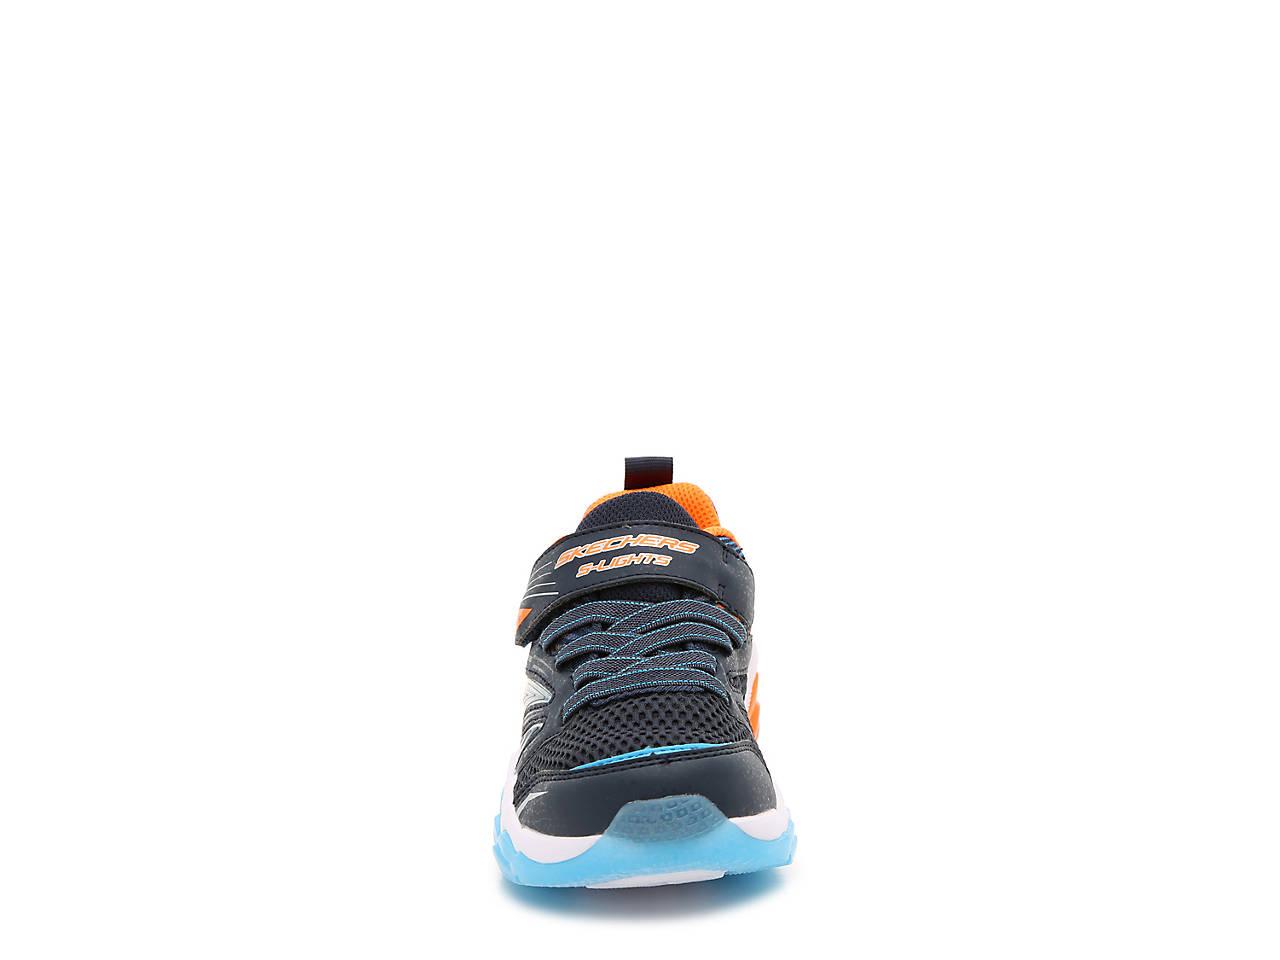 Skechers S Lights Rapid Flash 2.0 Light Up Sneaker Kids